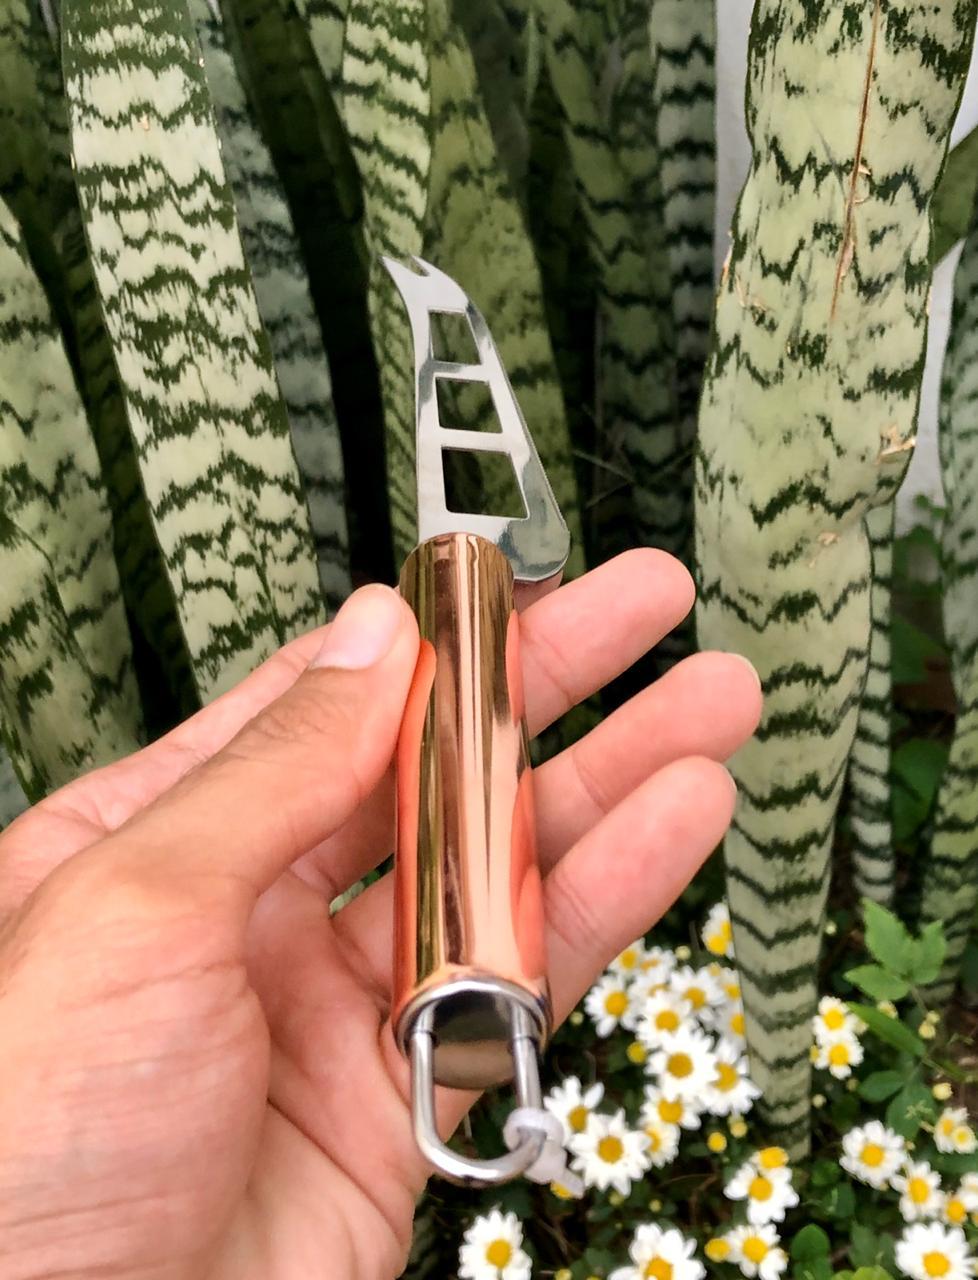 Faca cortadora de queijo aço inox cobre rose gold MimoStyle